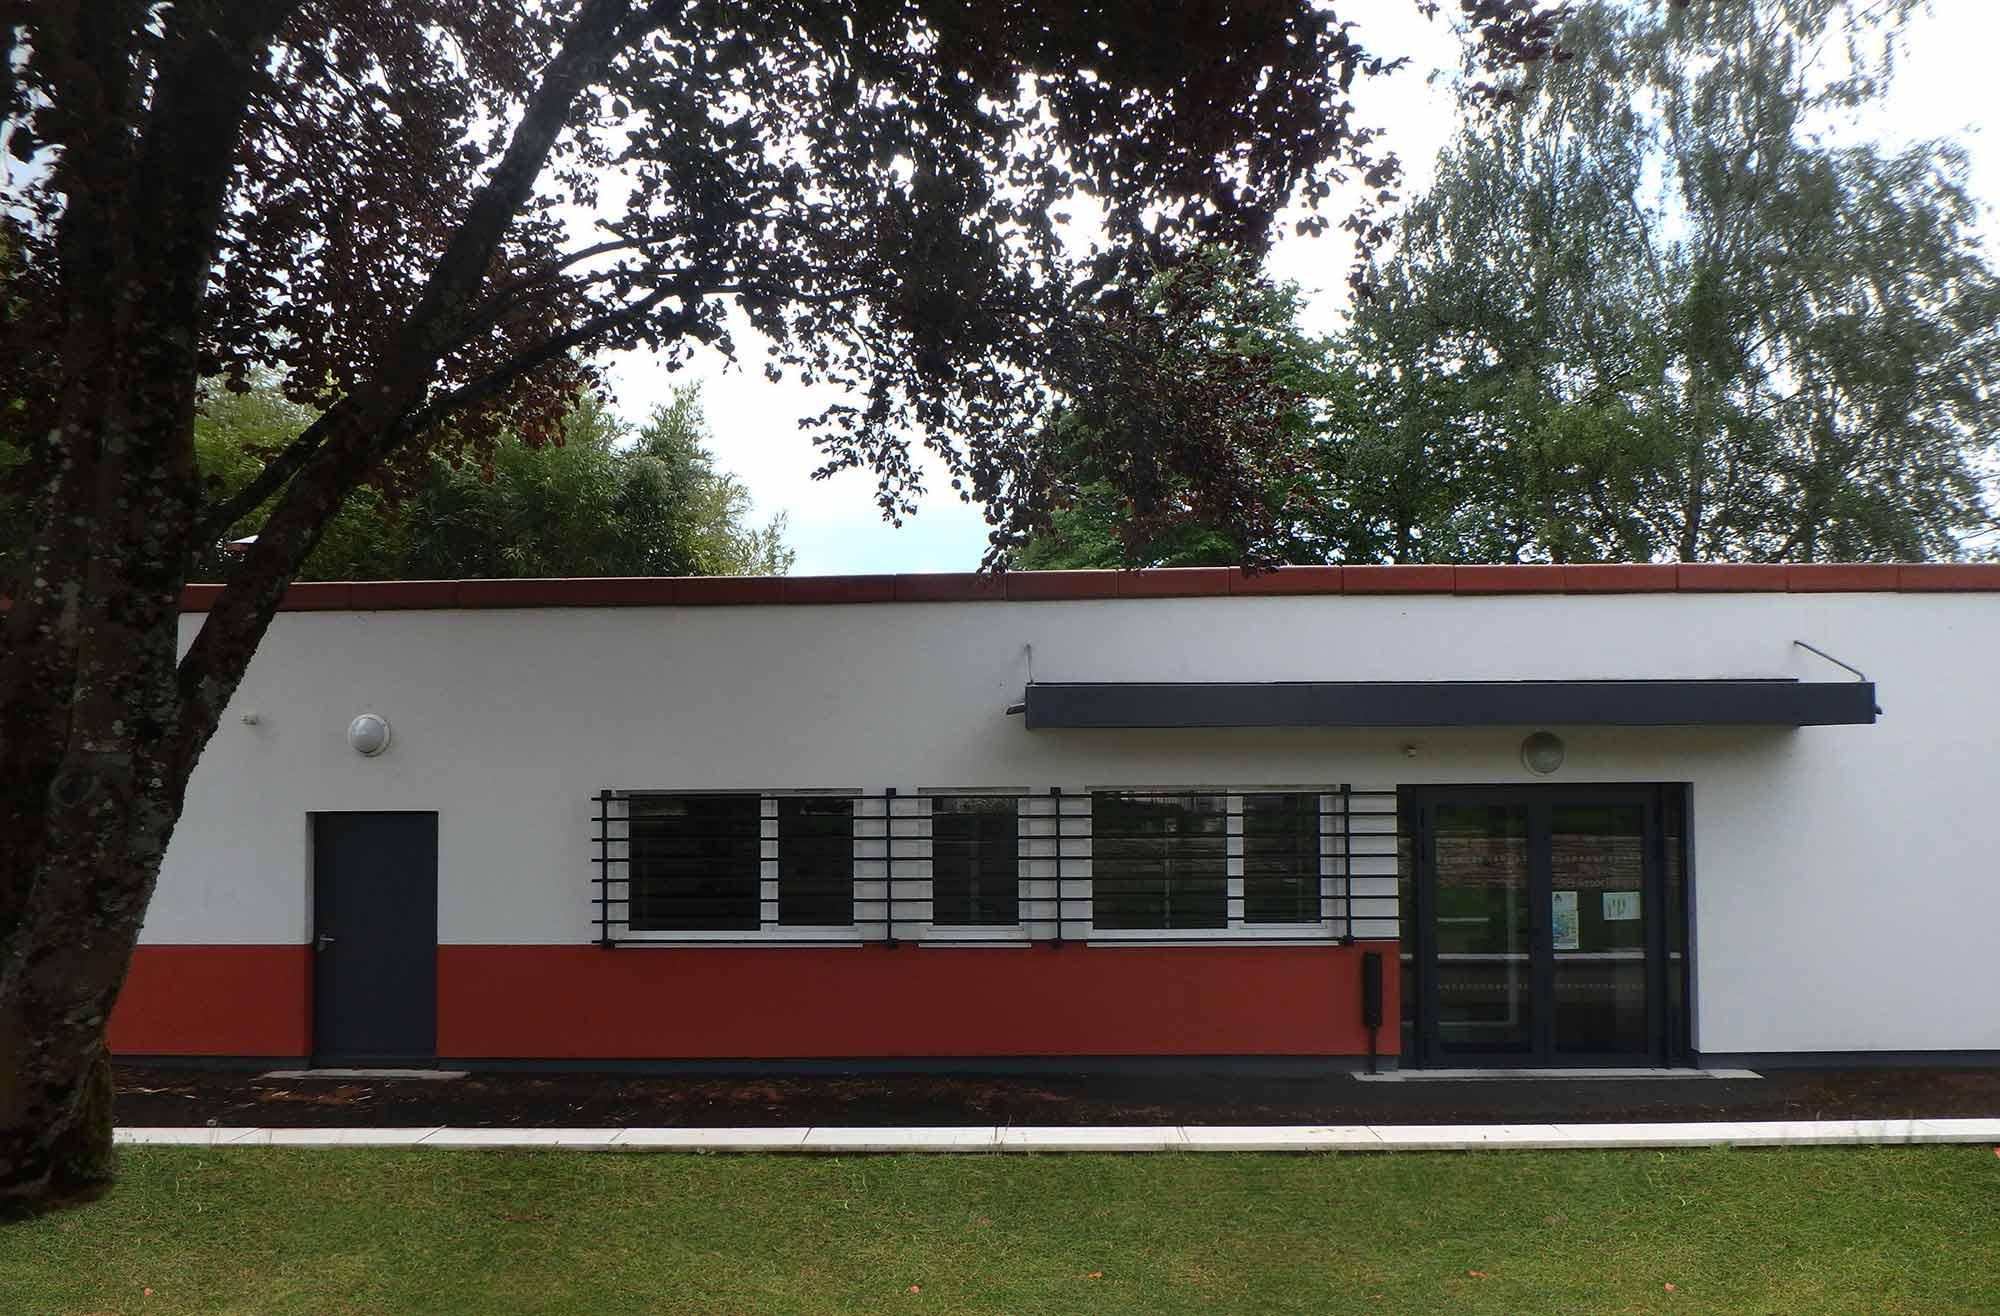 maison des association a ladoix-serrigny